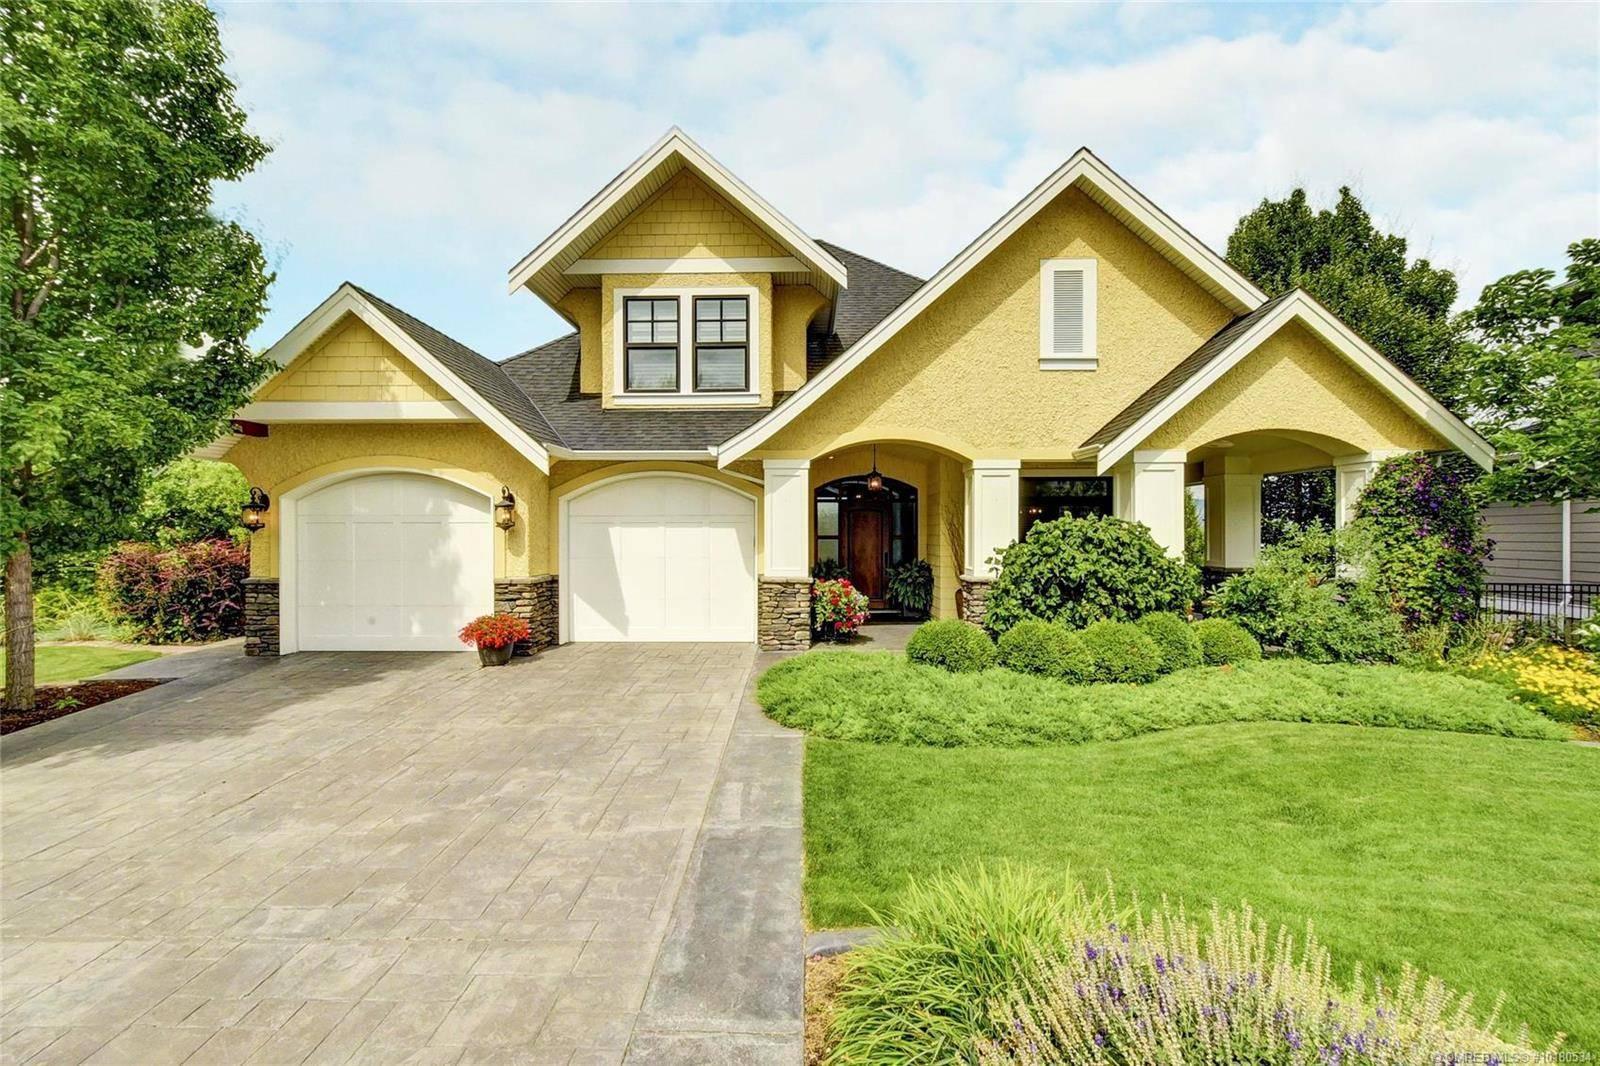 House for sale at 386 Rindle Ct Kelowna British Columbia - MLS: 10180534